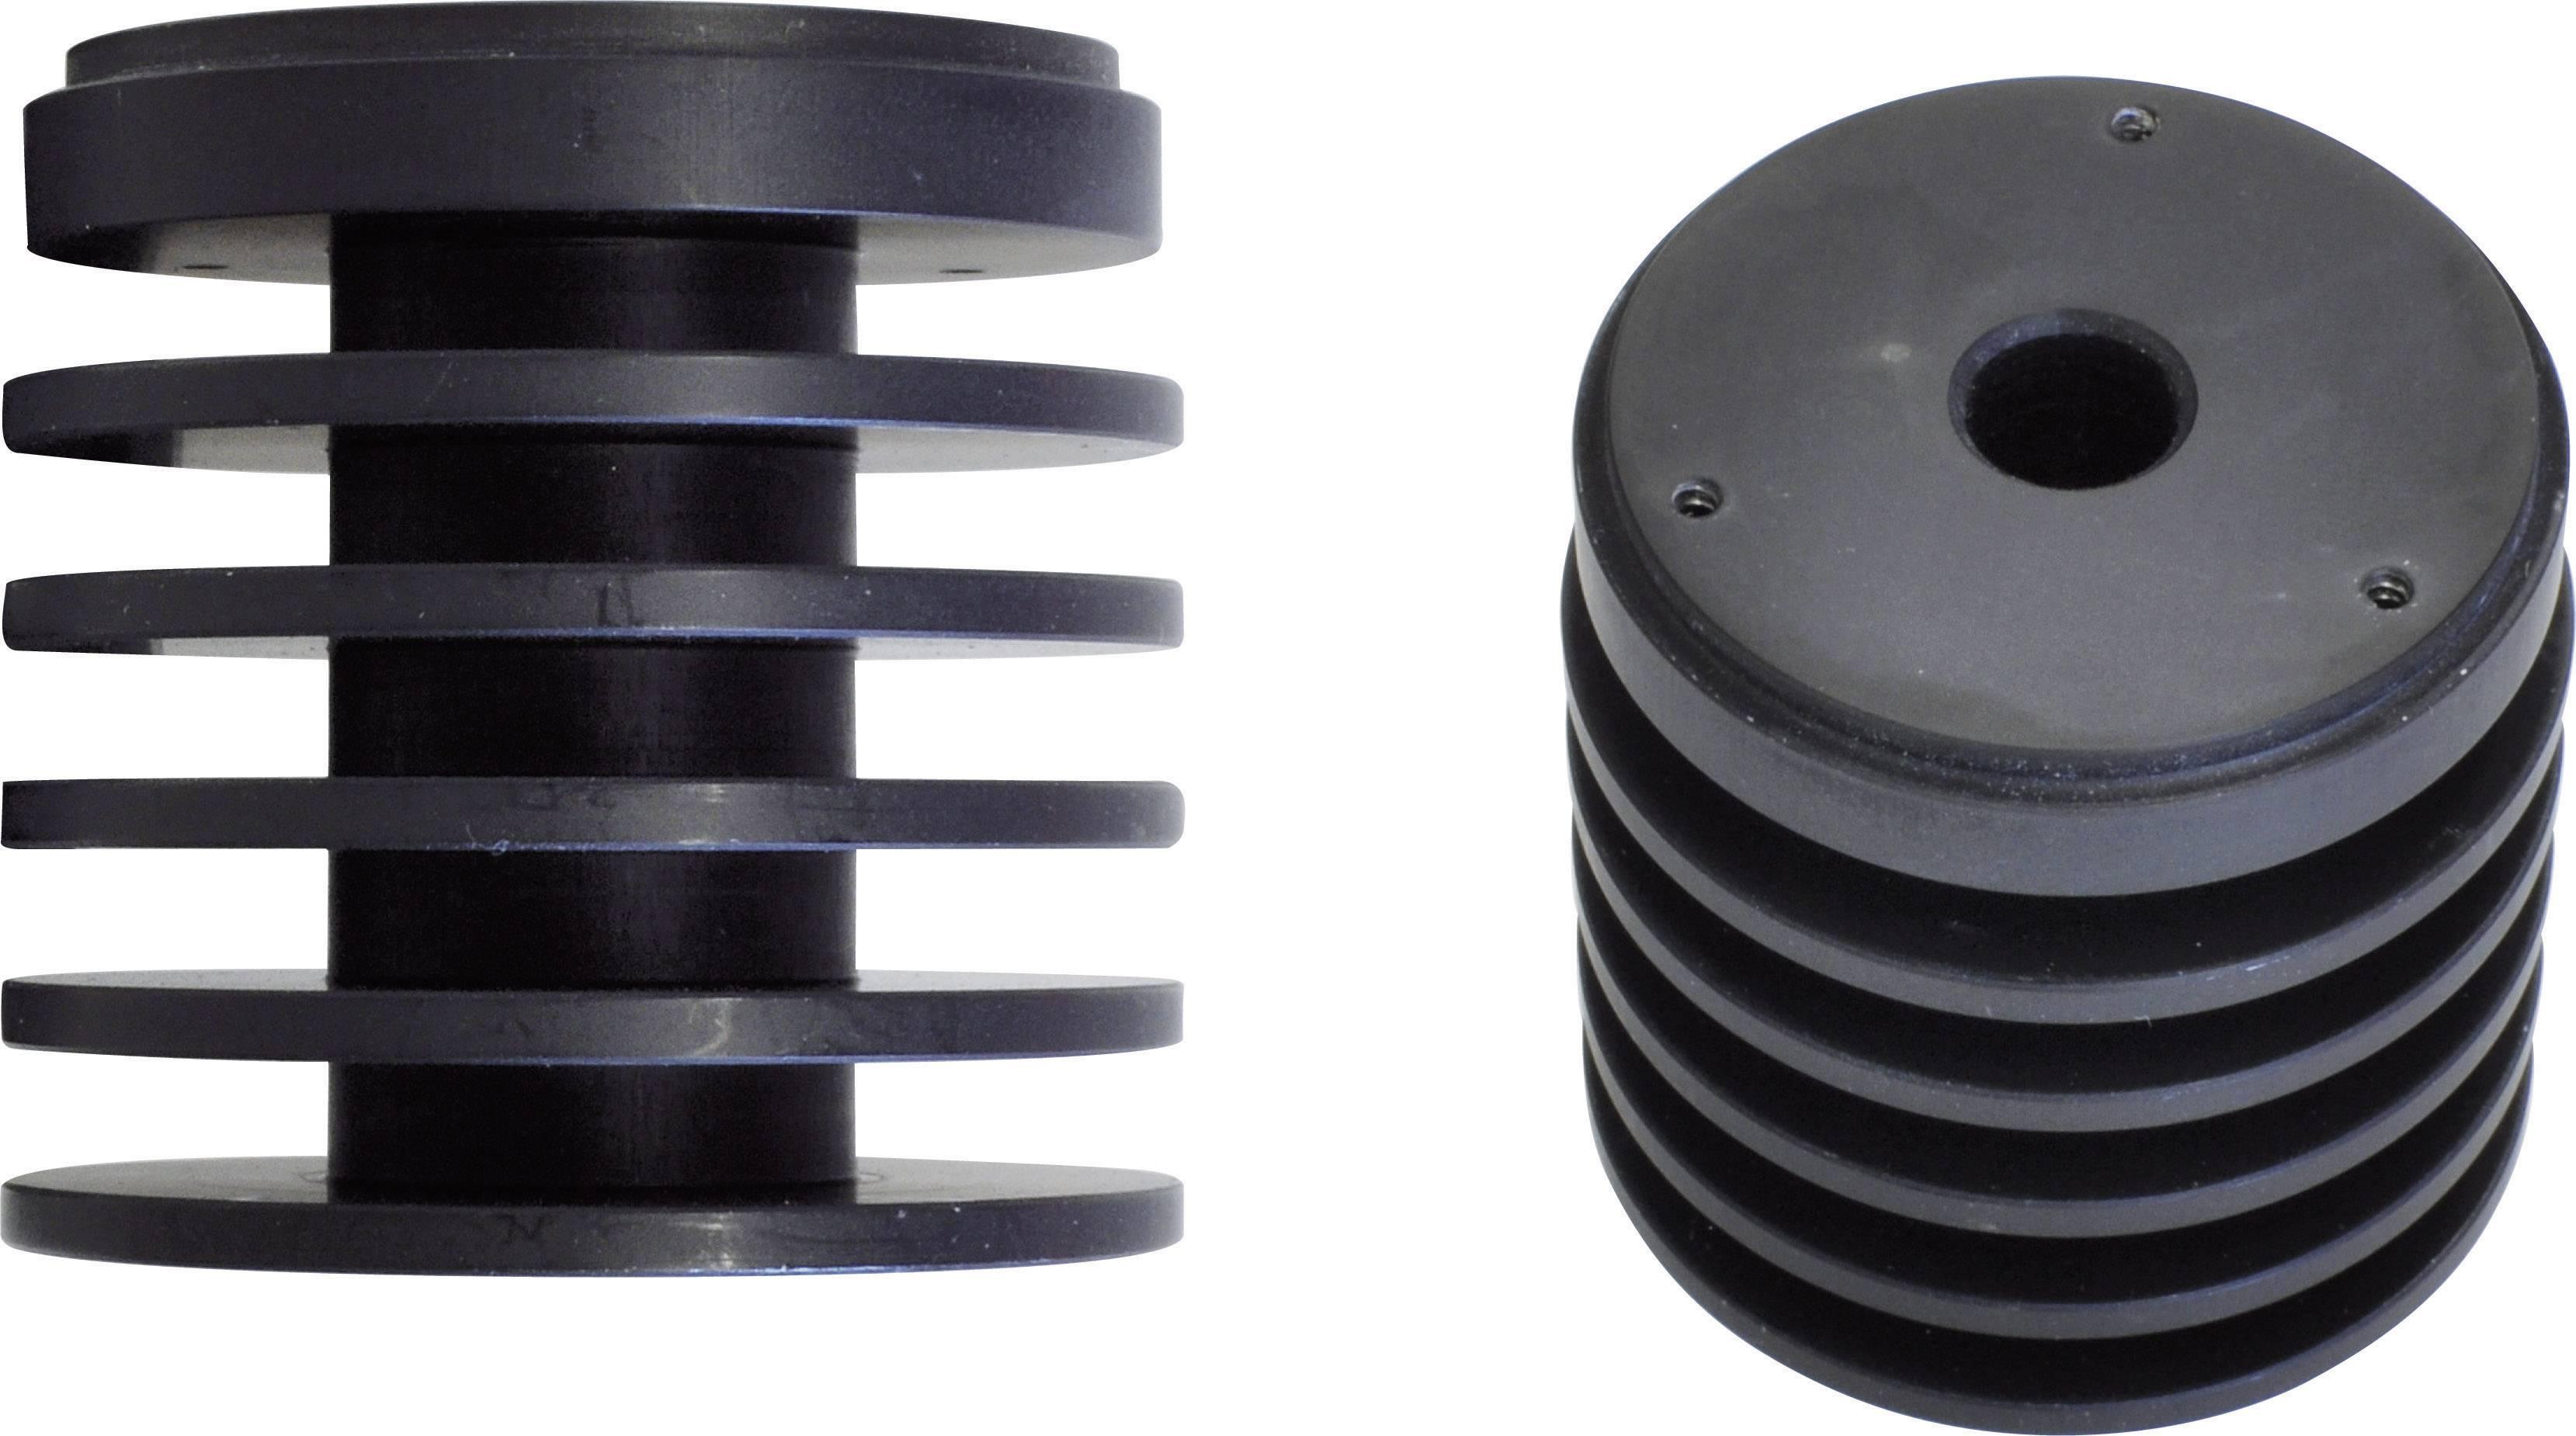 Chladič Barthelme ALU K2, 4.44 K/W, (Ø x v) 44 mm x 45 mm